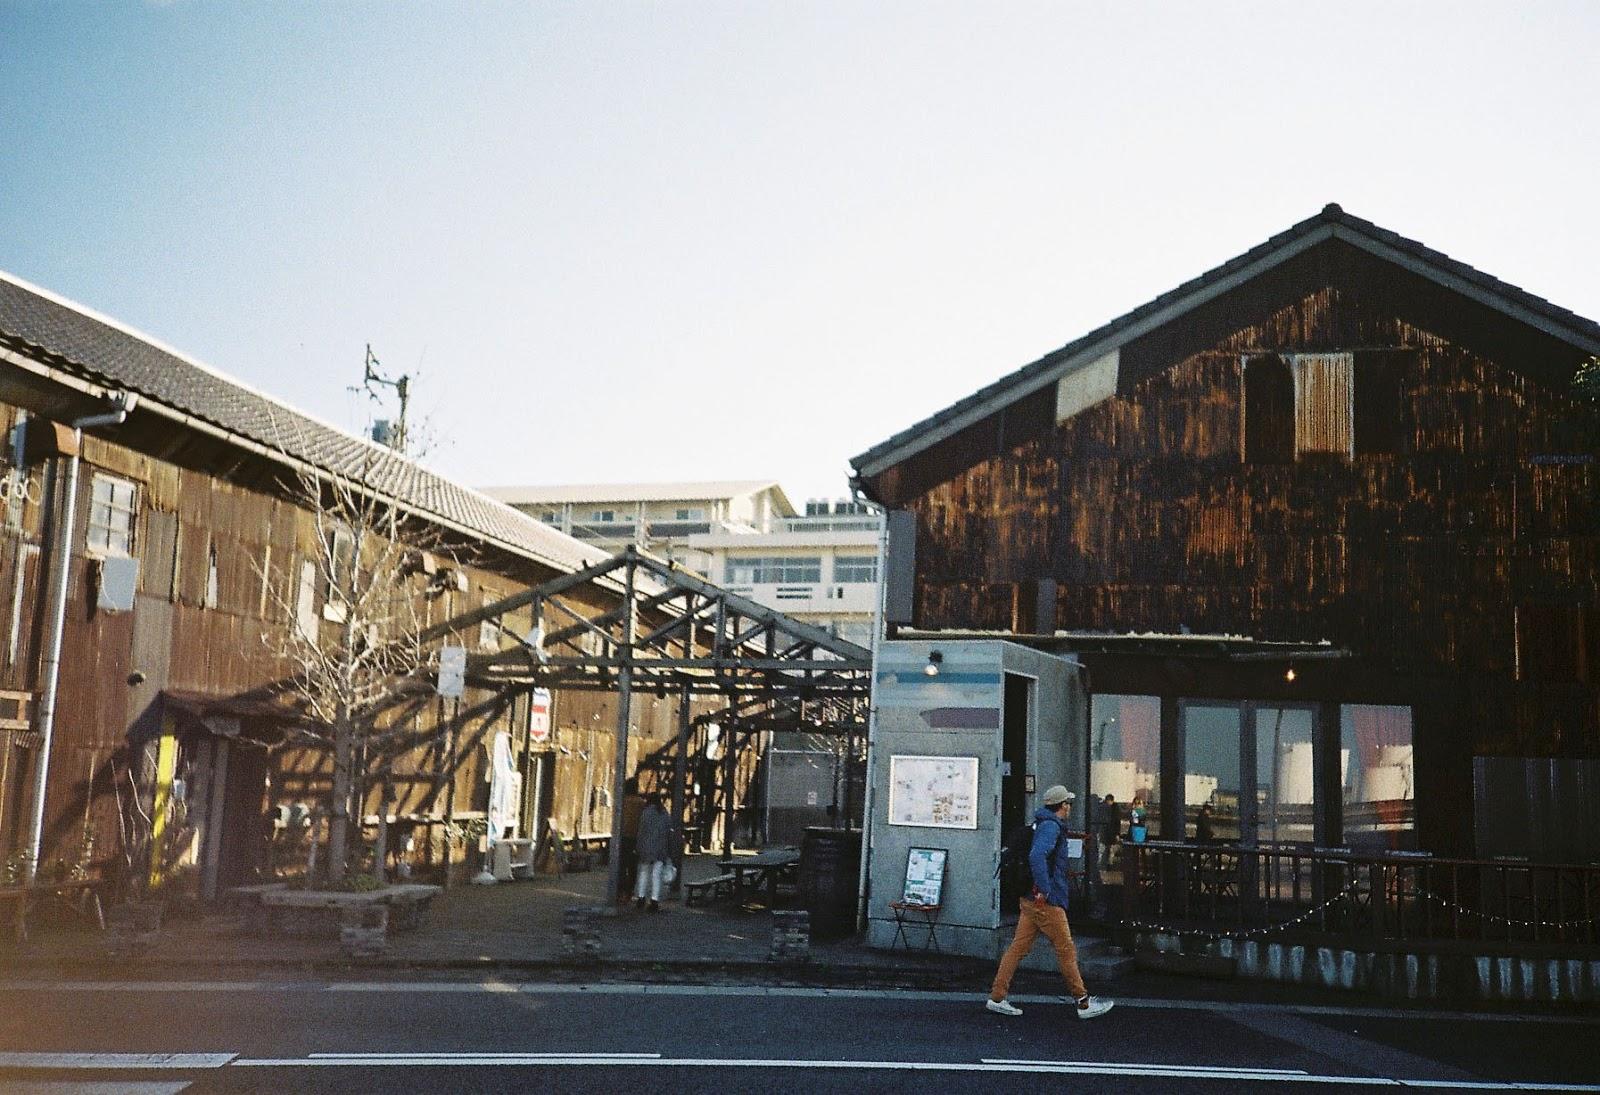 sasa chiang:: 【高松】umie。北浜alley‧倉庫裡的咖啡店